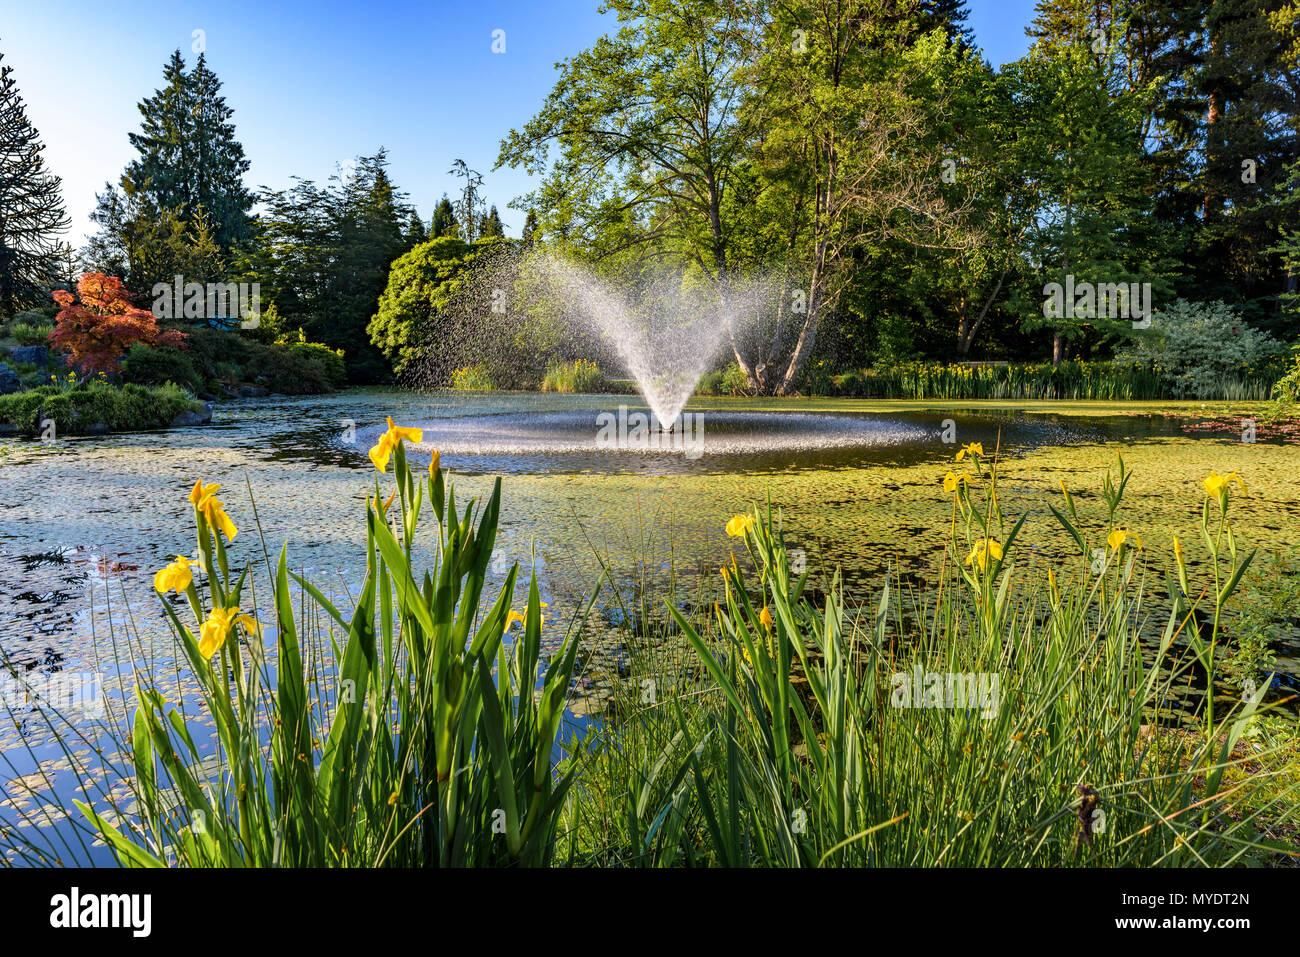 Pond with fountain, VanDusen Botanical Garden, Vancouver, British Columbia, Canada. - Stock Image